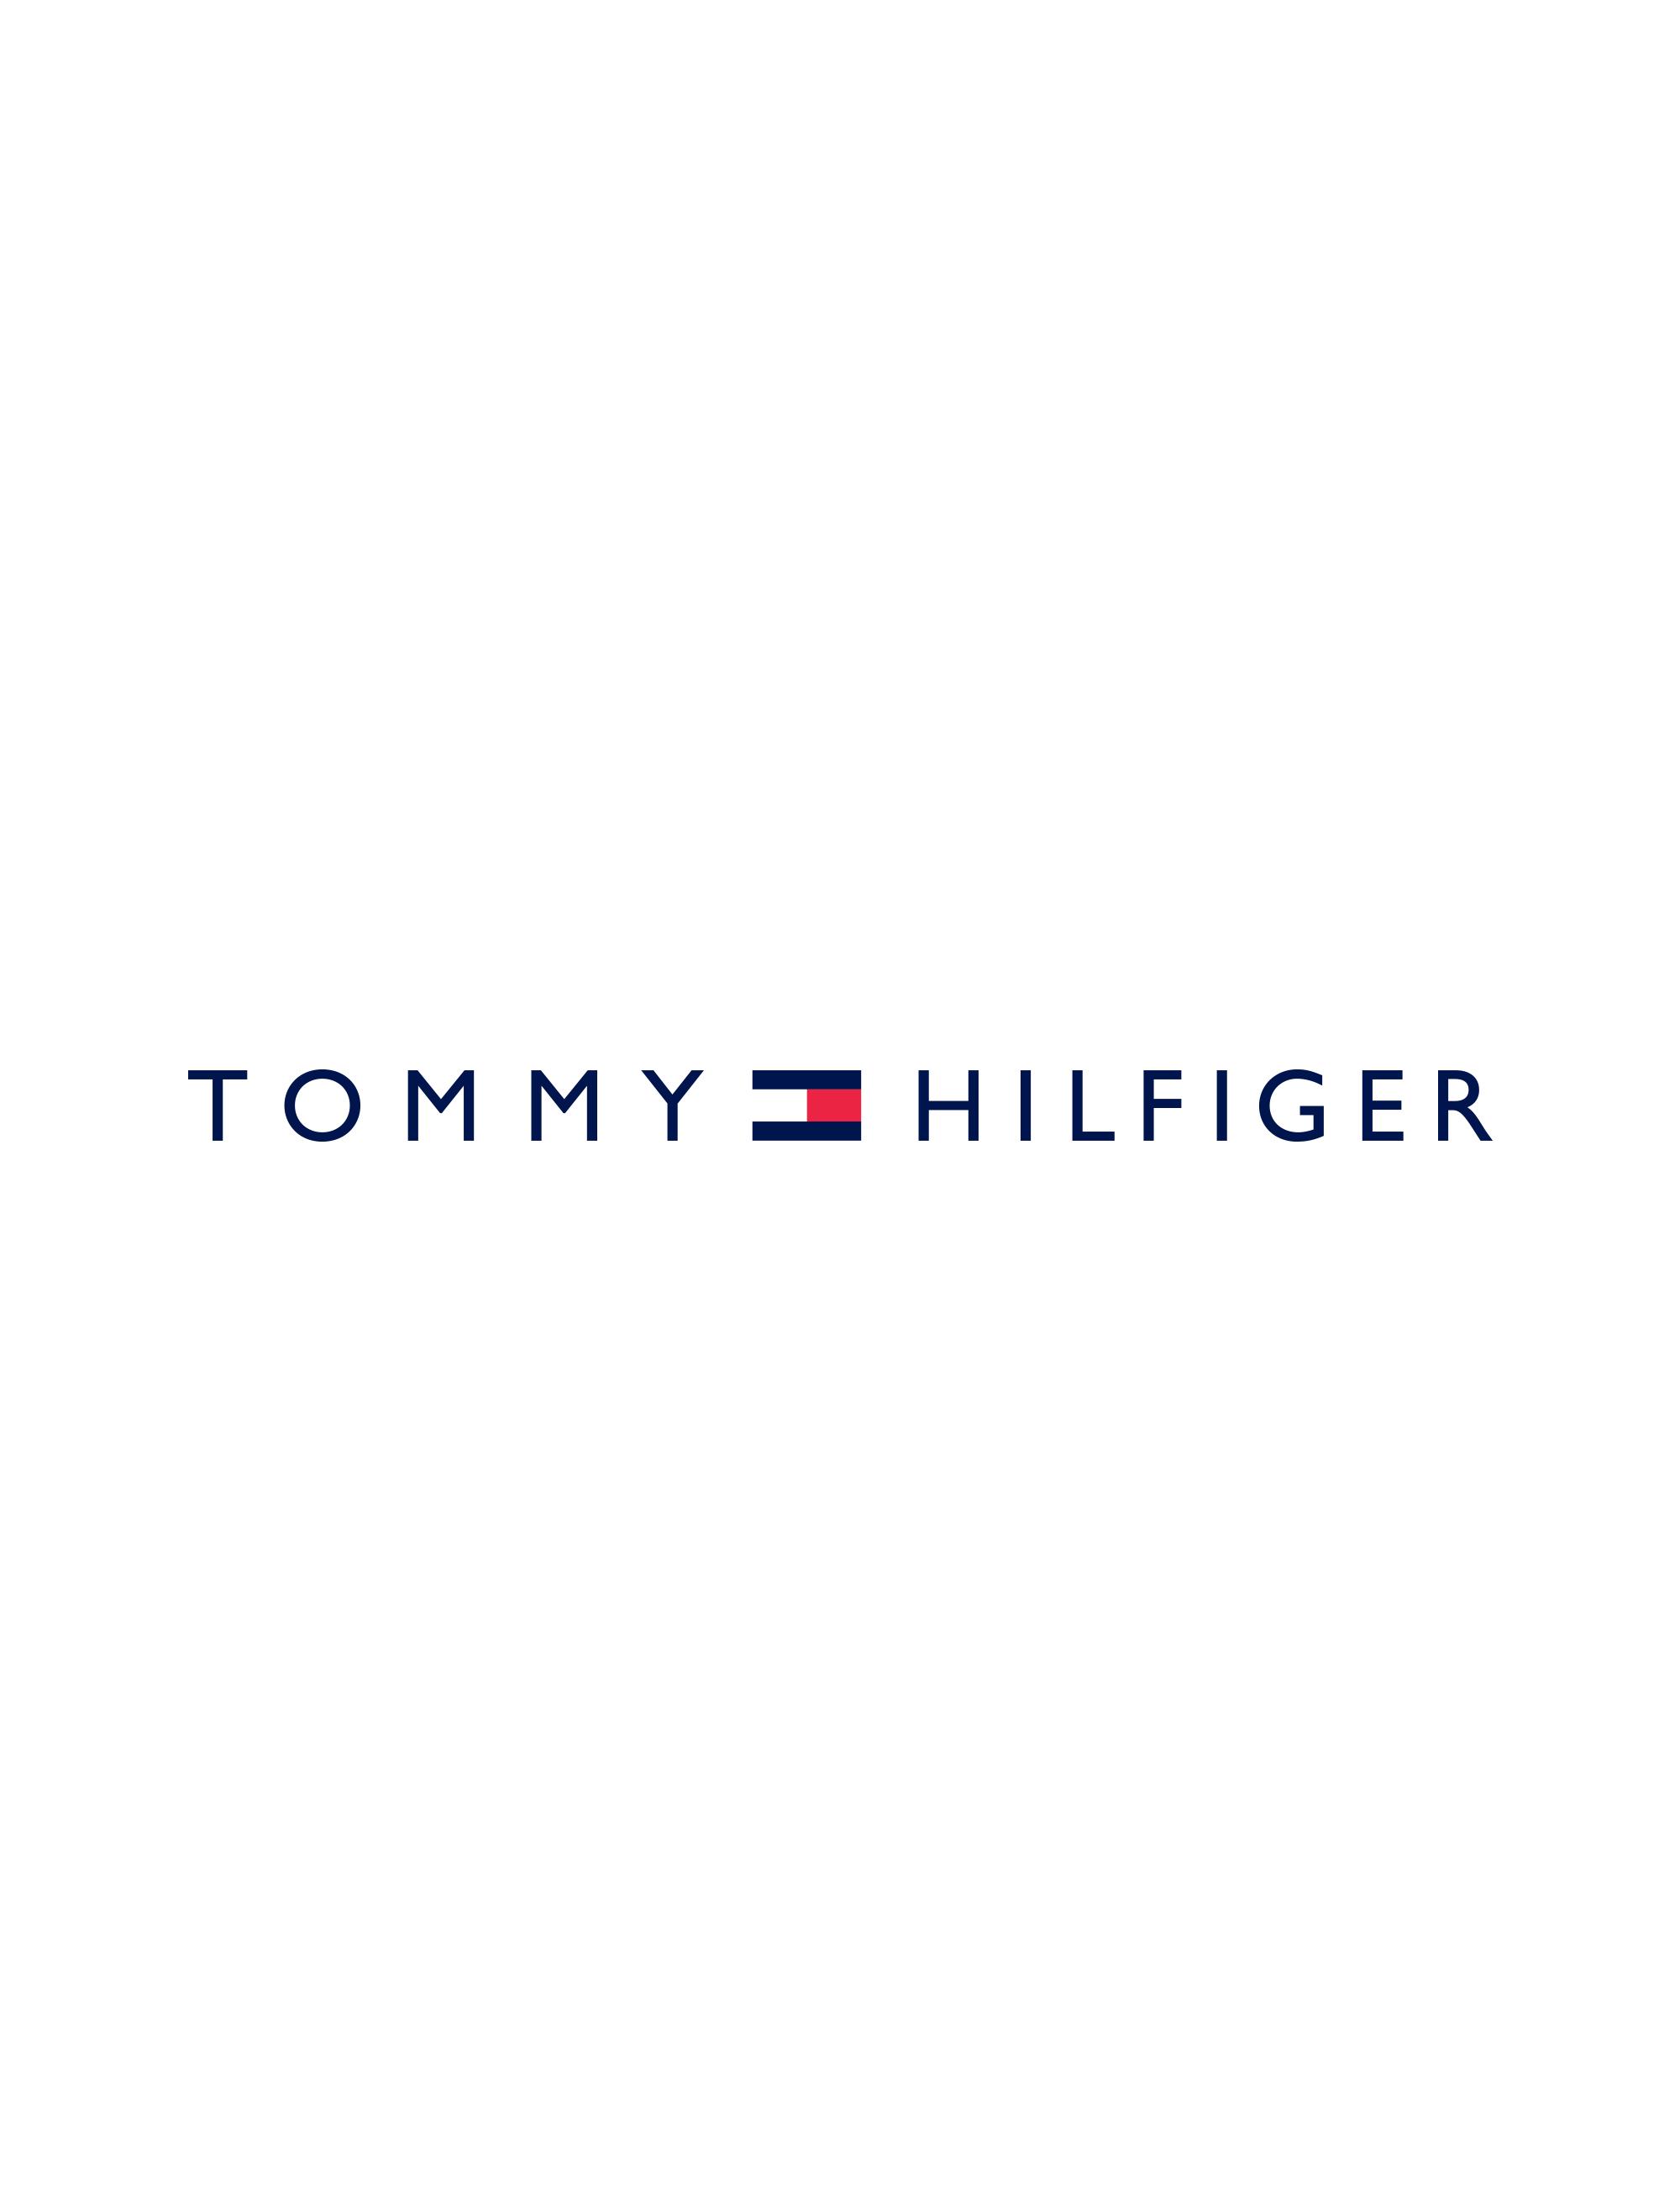 Tommy Hilfiger Stainless Steel Sport Watch